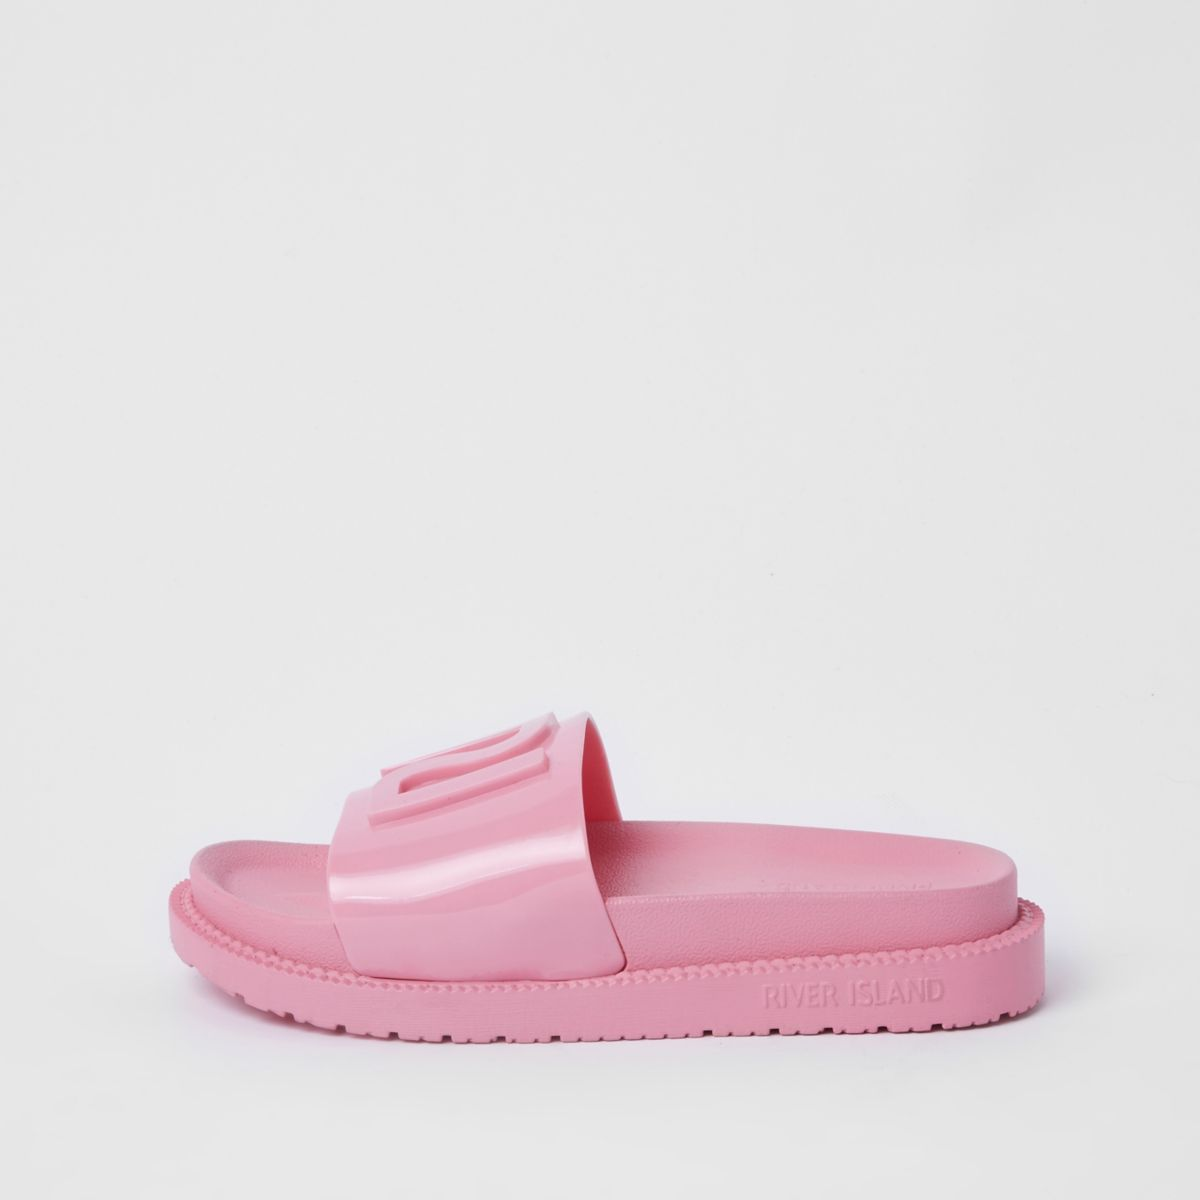 Pink RI branded jelly sliders